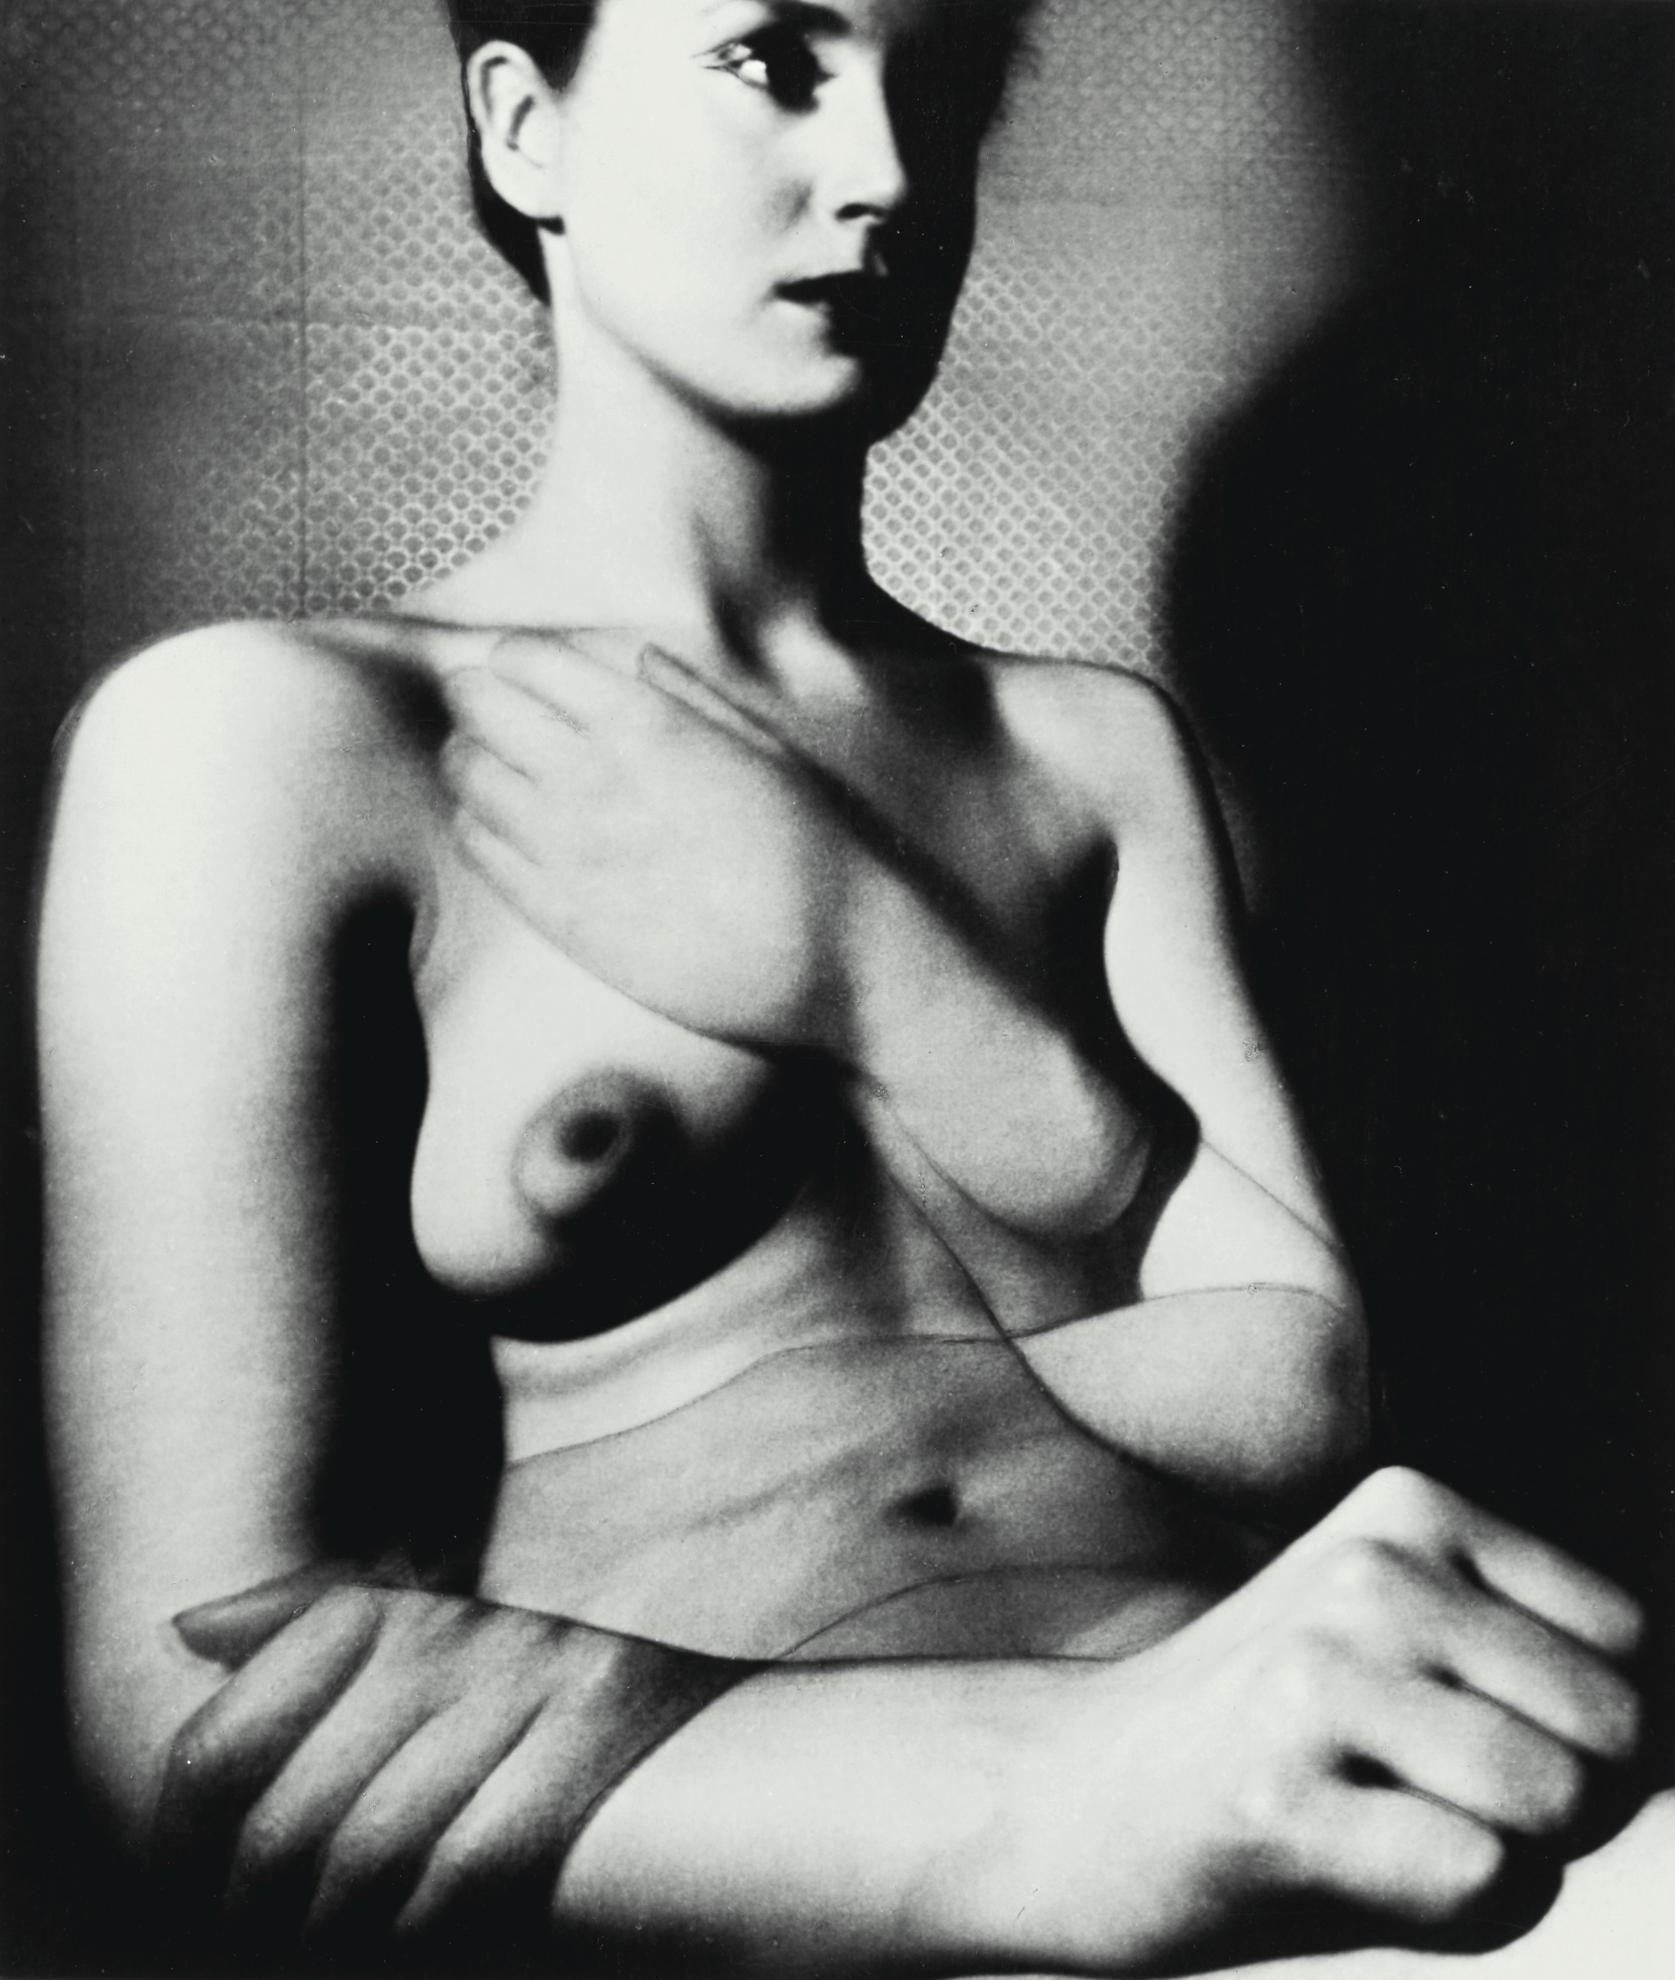 Bill Brandt-London-1956